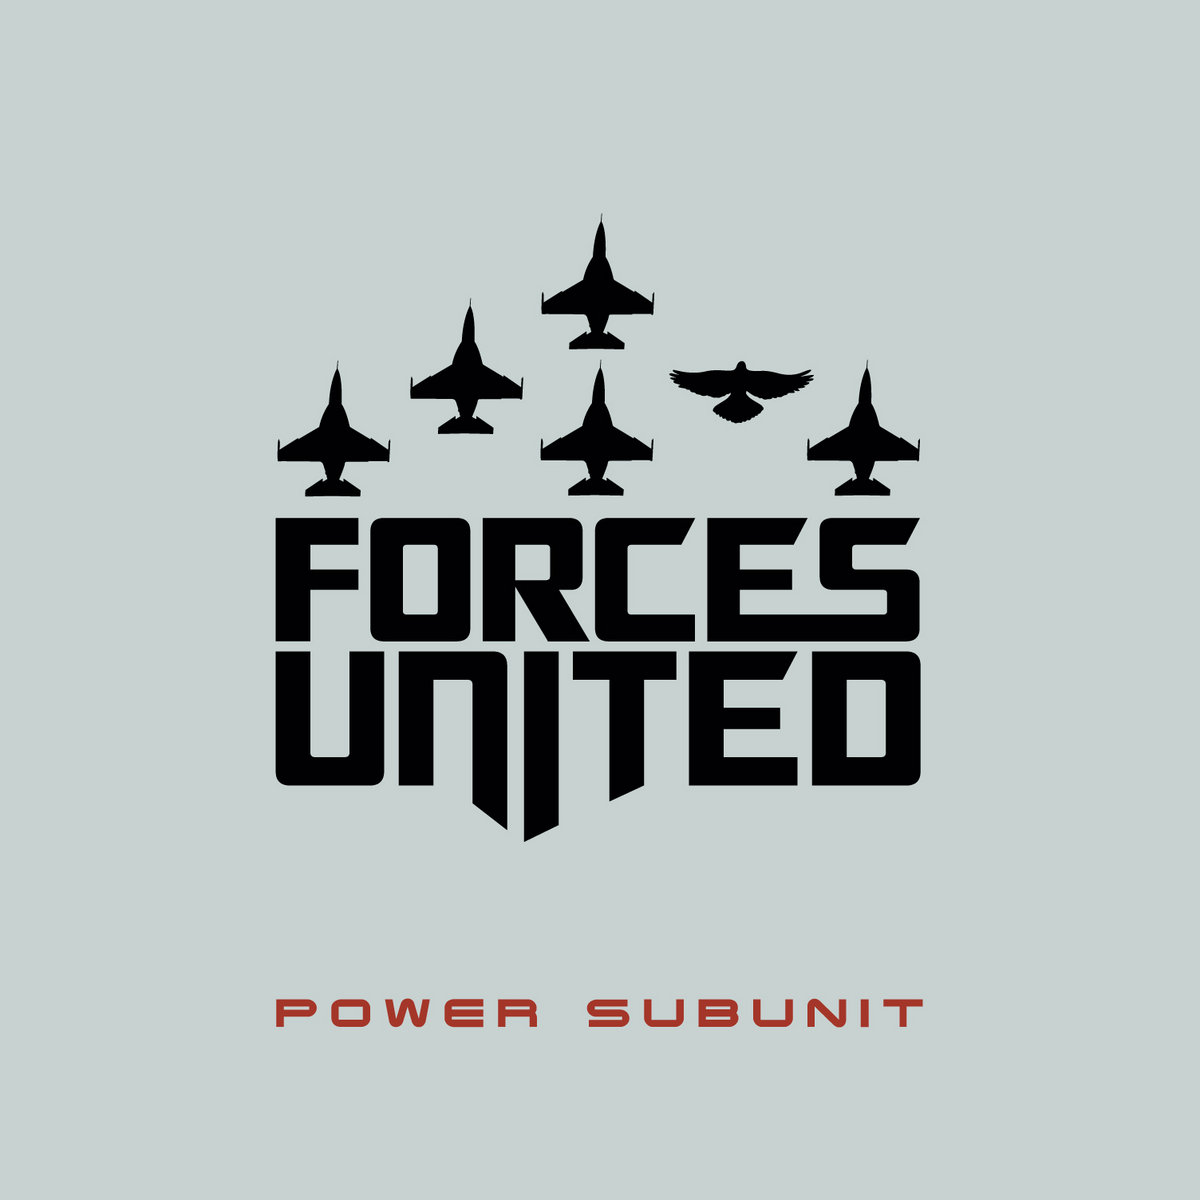 Forces United - Power Subunit